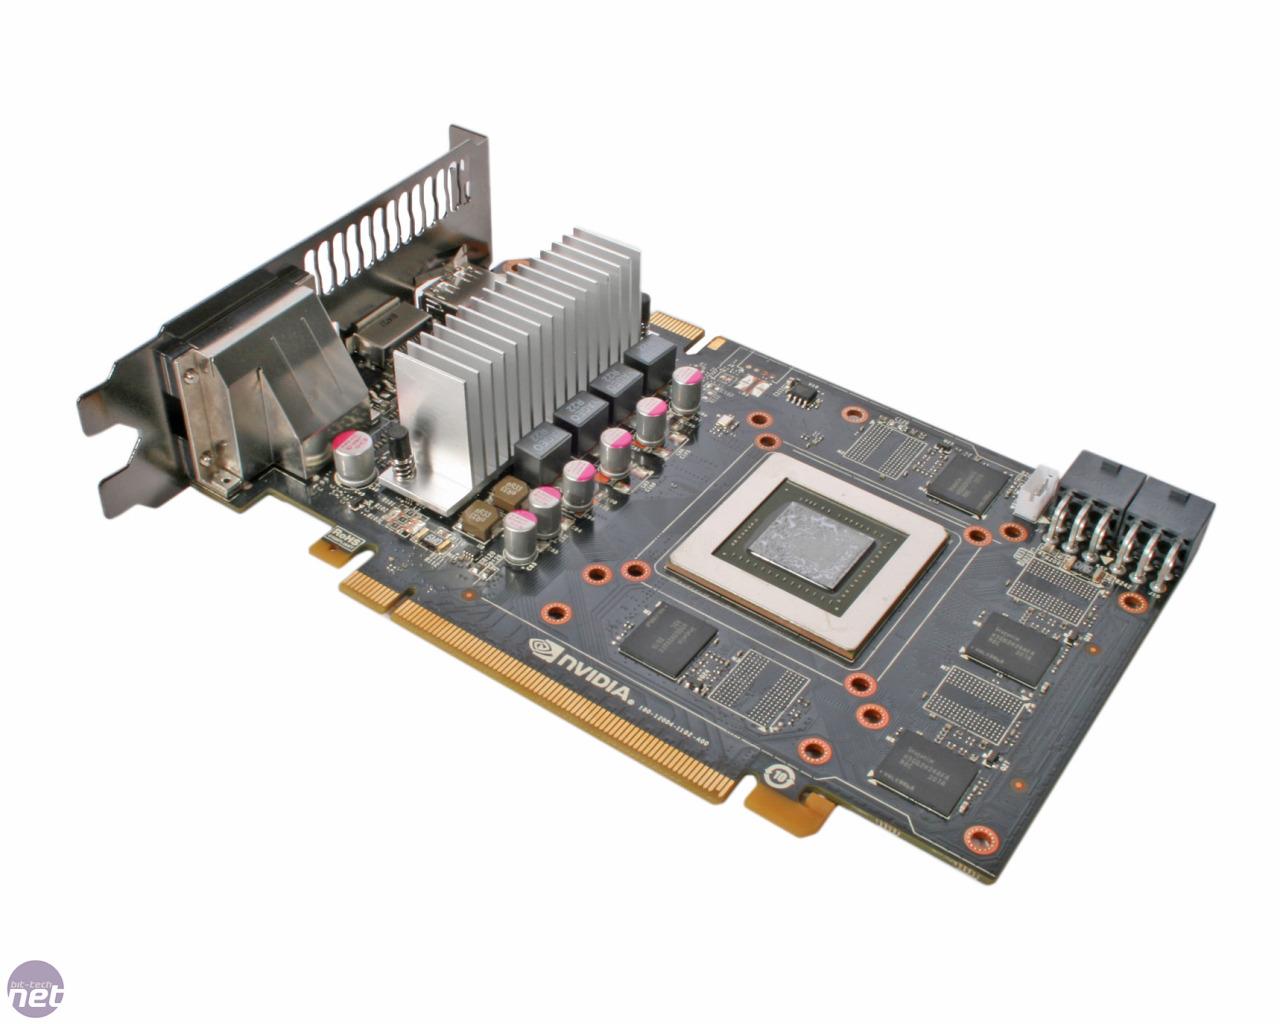 Видеокарта 8Gb <PCI-E> Sapphire RX 470 8G MINING 11256-57-10G <AMD RX470 8192Mb 256b GDDR5 1206/7000 DVIx1>